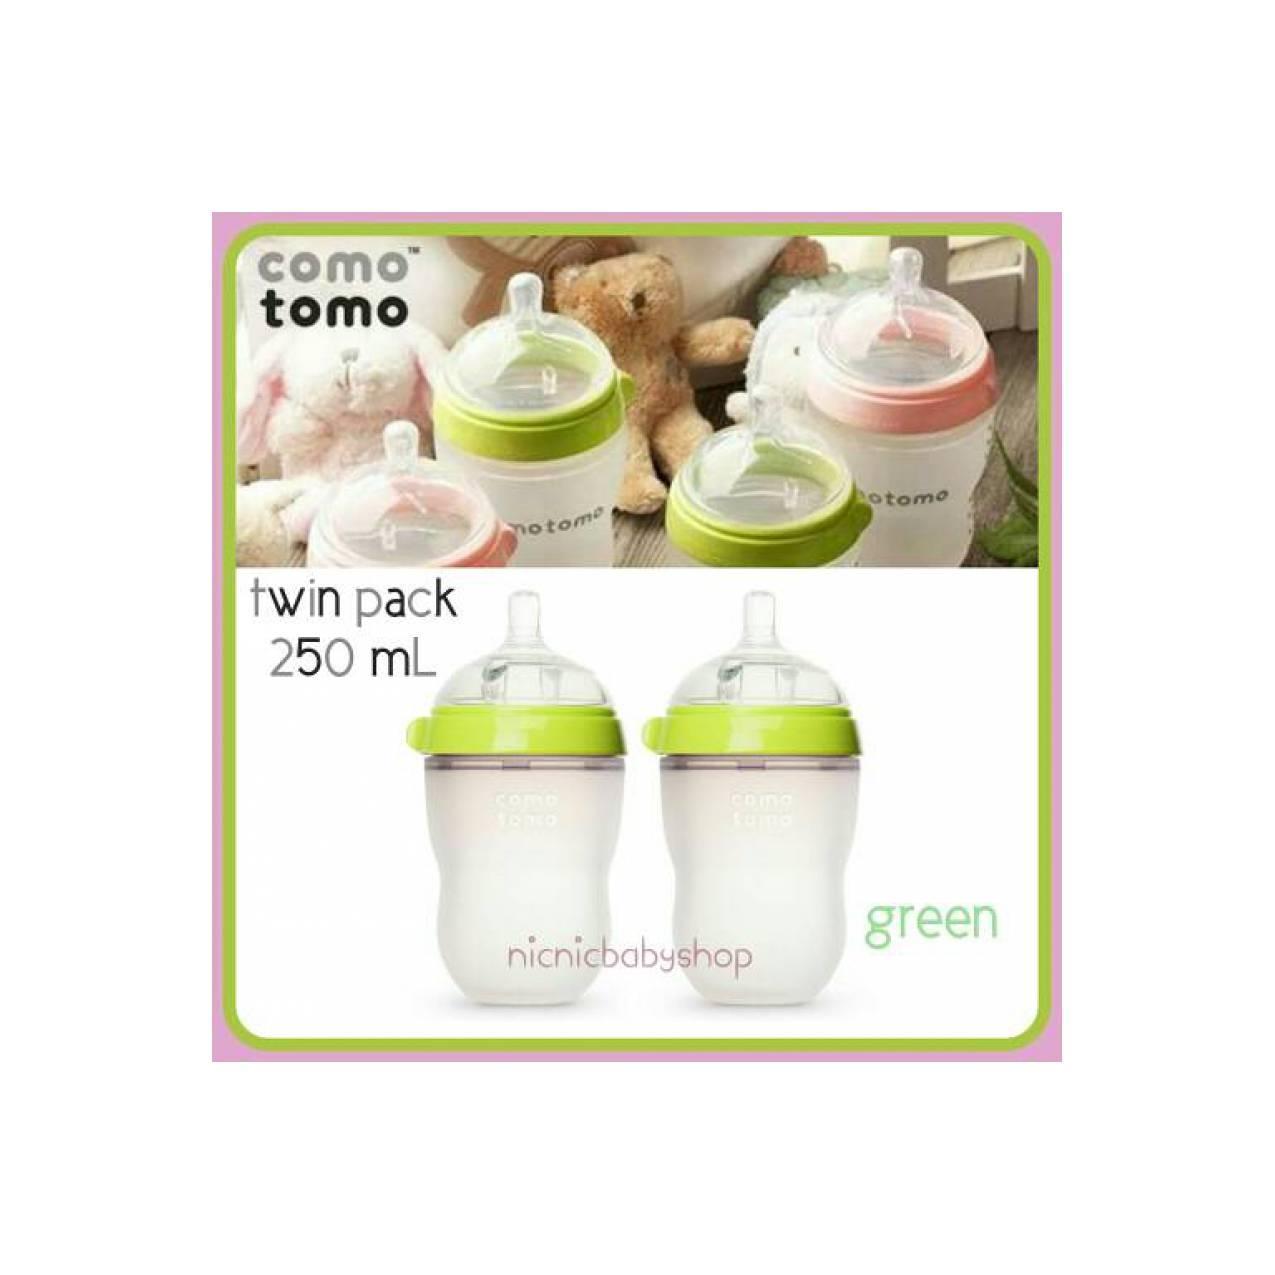 Promo Terlengkap Twin Tulipware Sunny Green Set Di Toko Online Shop Comotomo 250 Ml Pack Baby Bottle